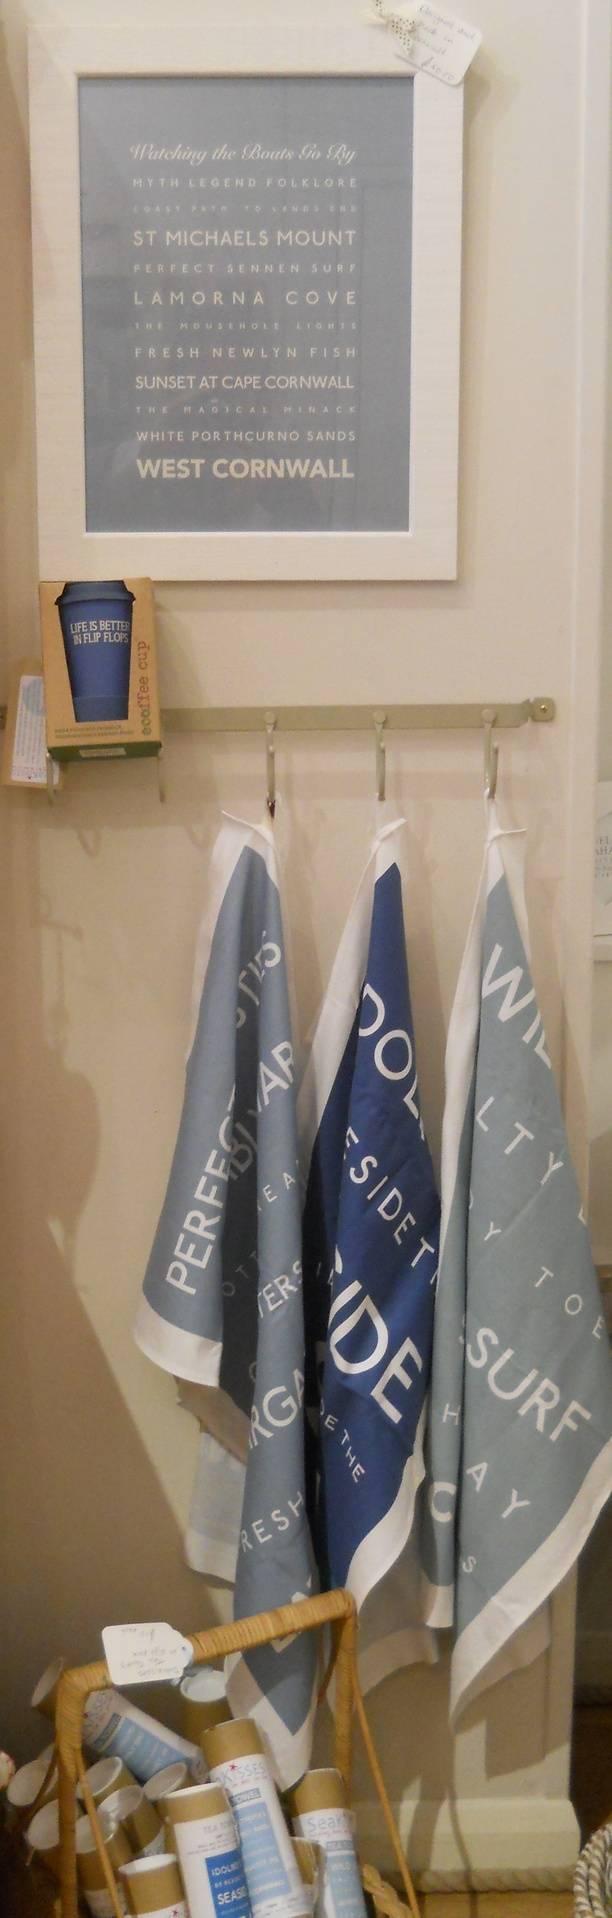 Seakisses Tea Towels